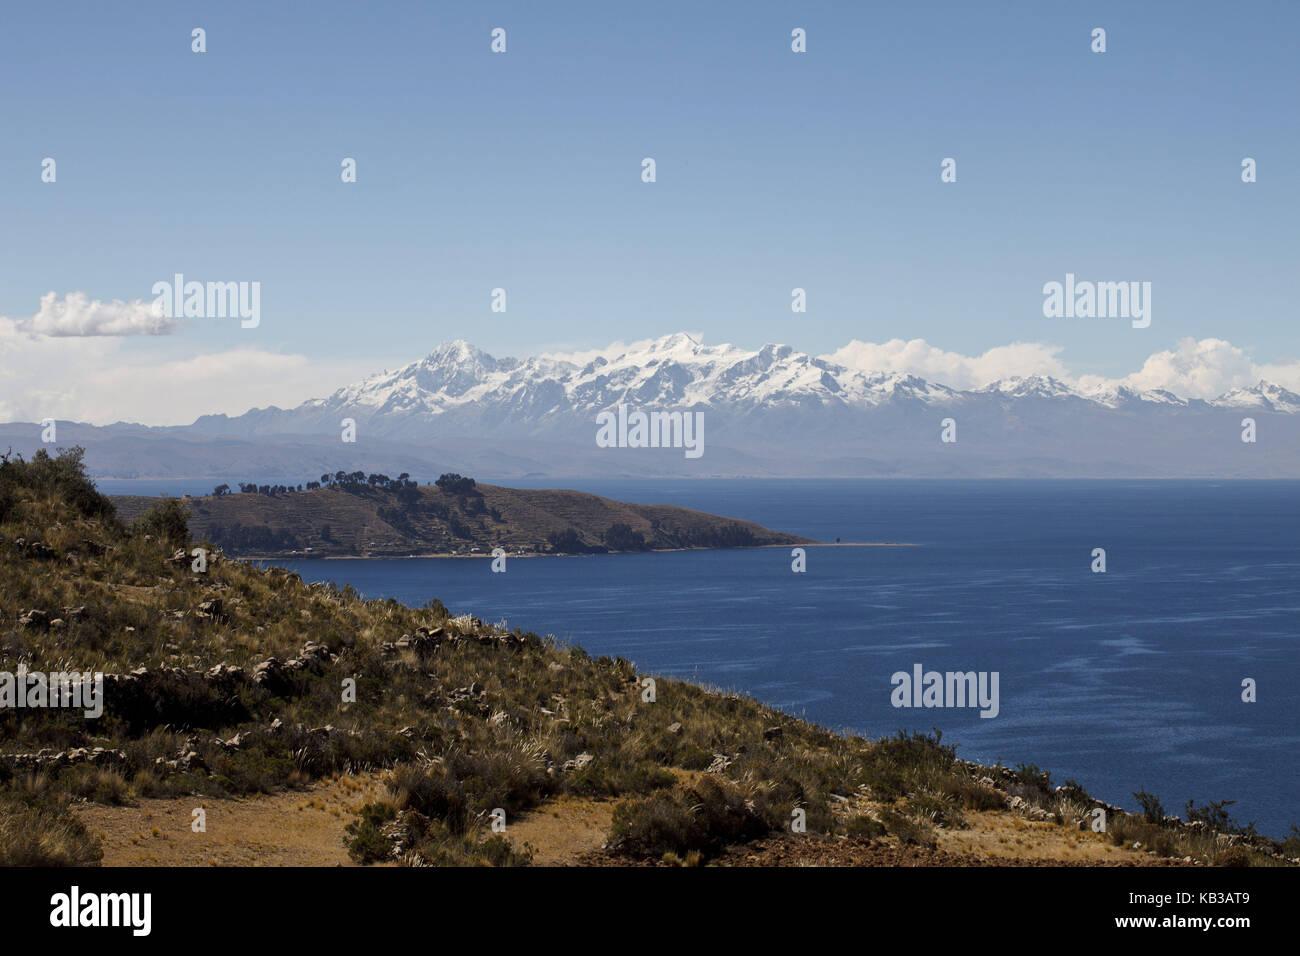 Bolivia, Titicacasee, Copacabana, - Stock Image